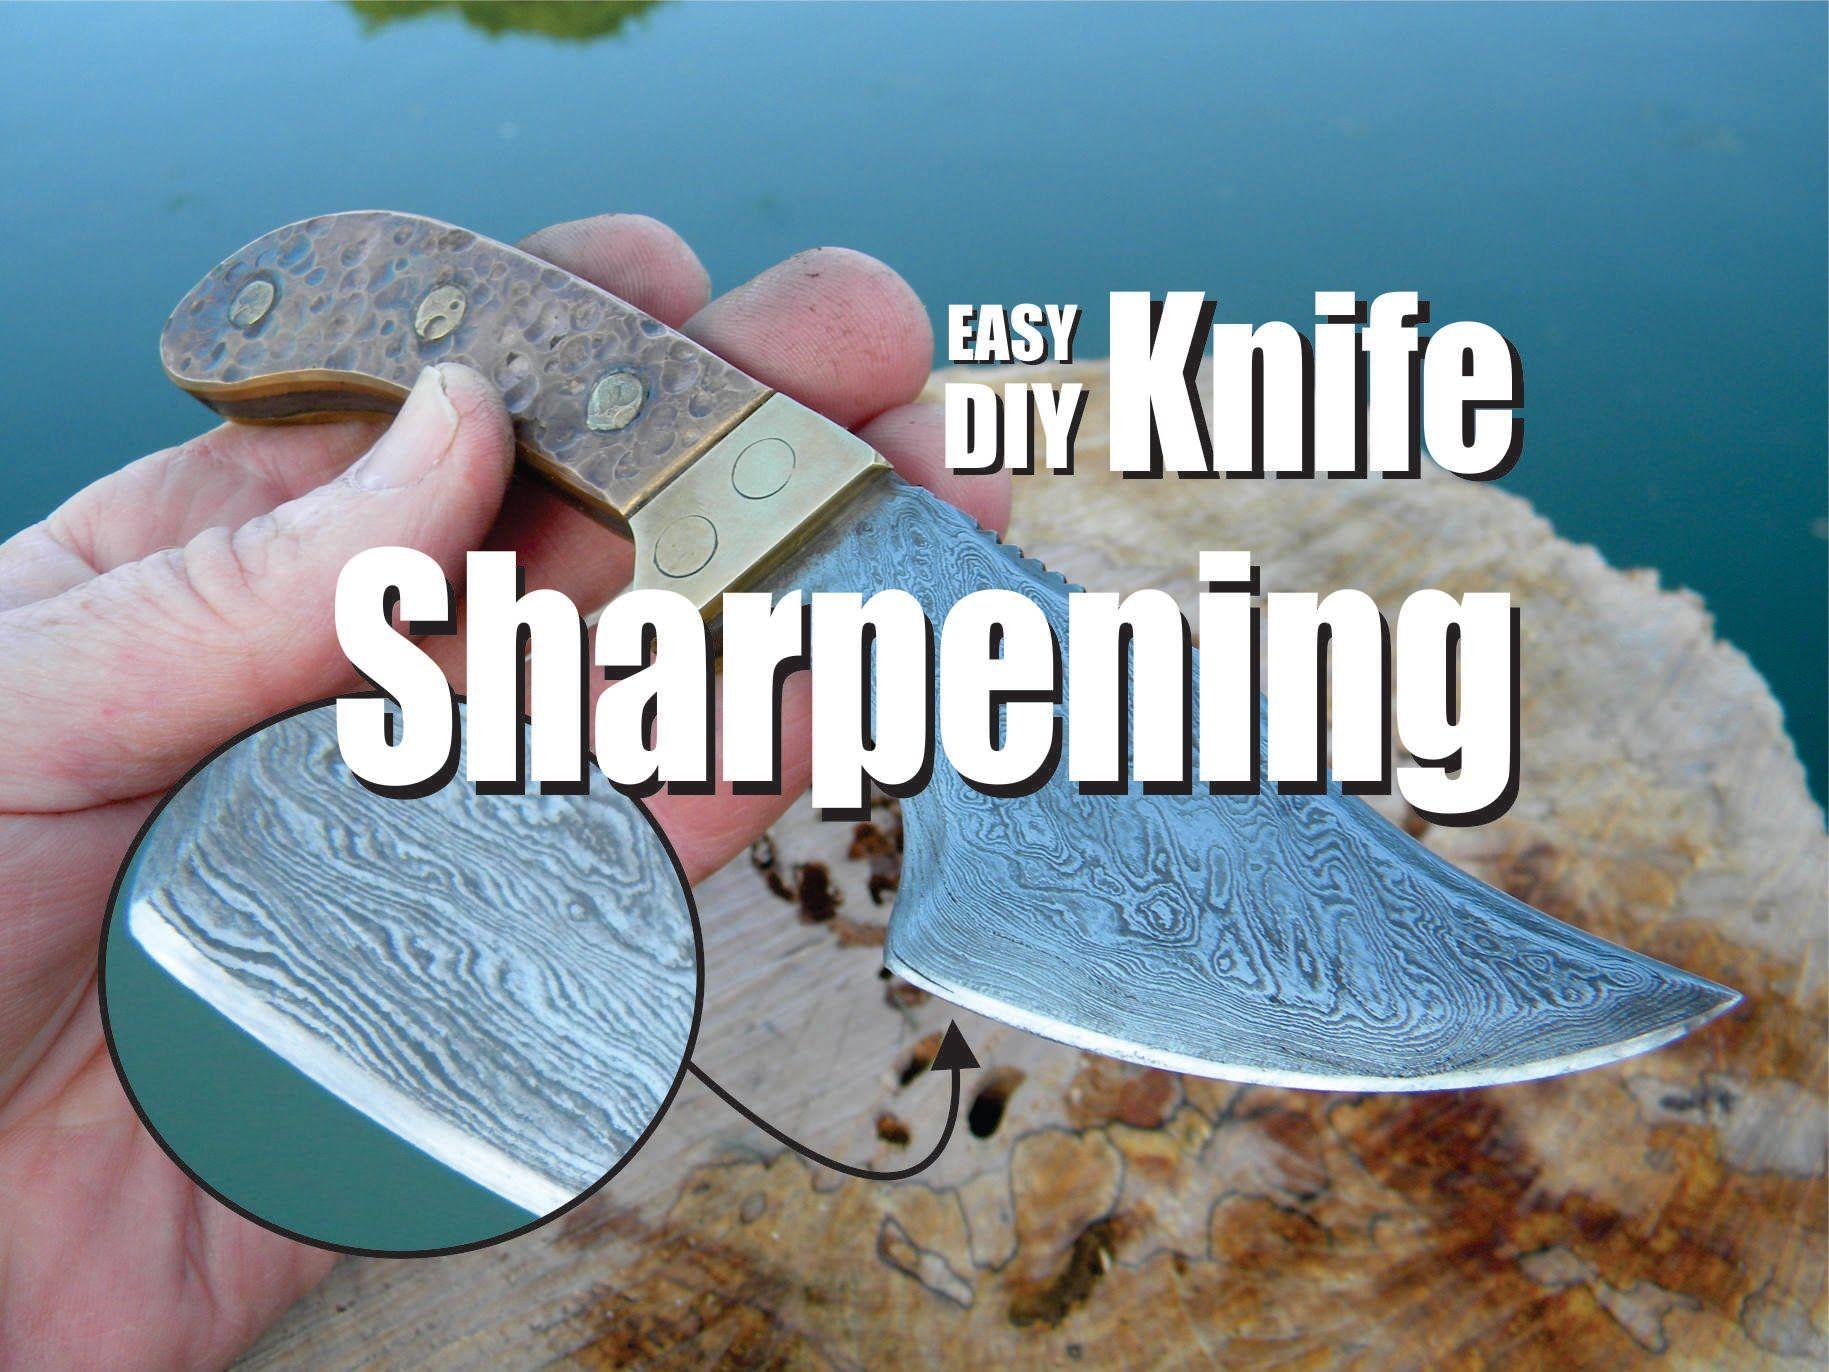 Diy easy knife sharpening with lansky sharpening stones